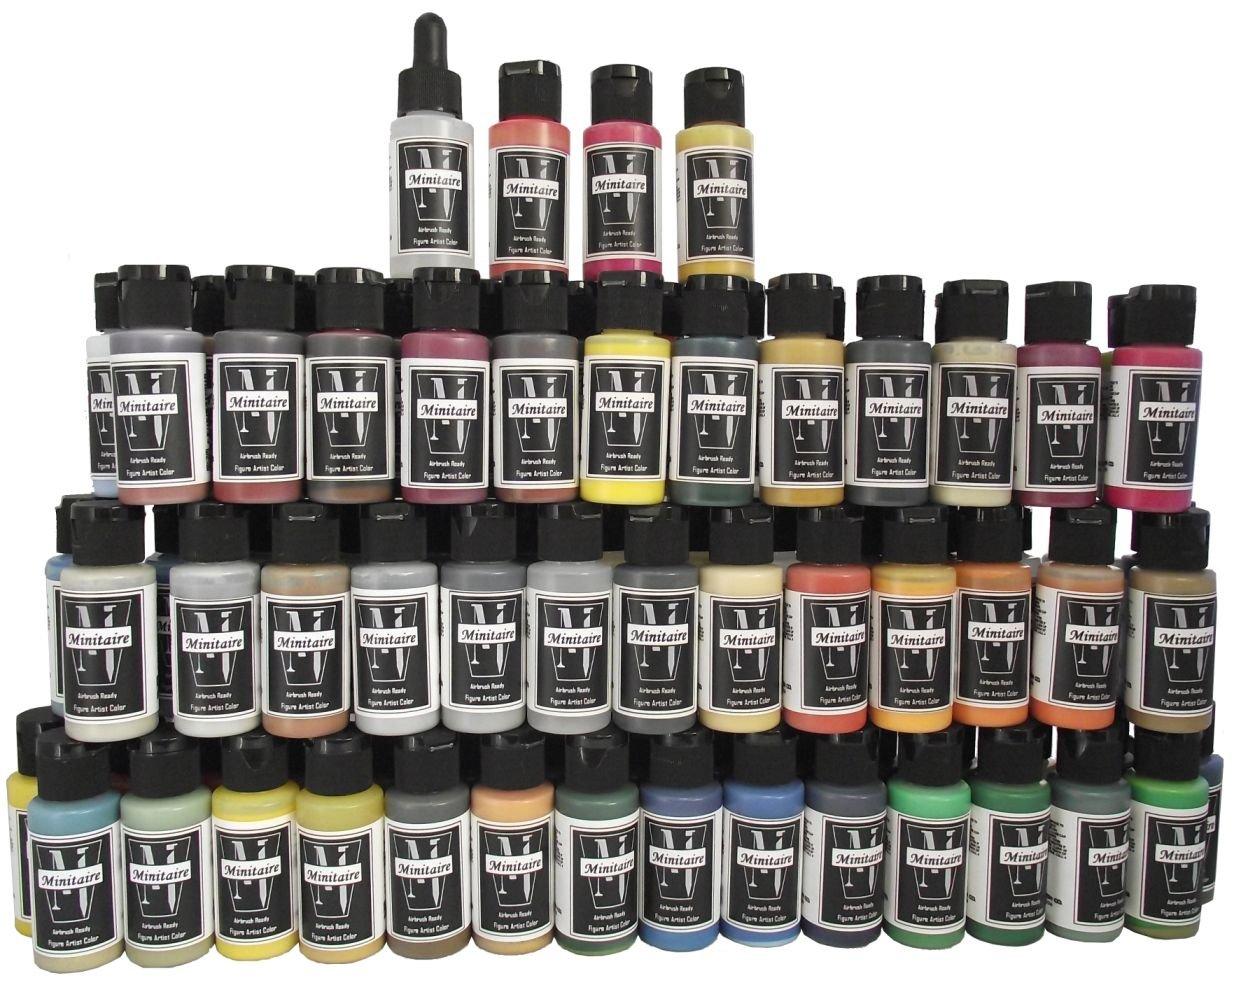 Badger Air-Brush Company Minitaire Color Paint Set with Color Coat/Paint Retarder